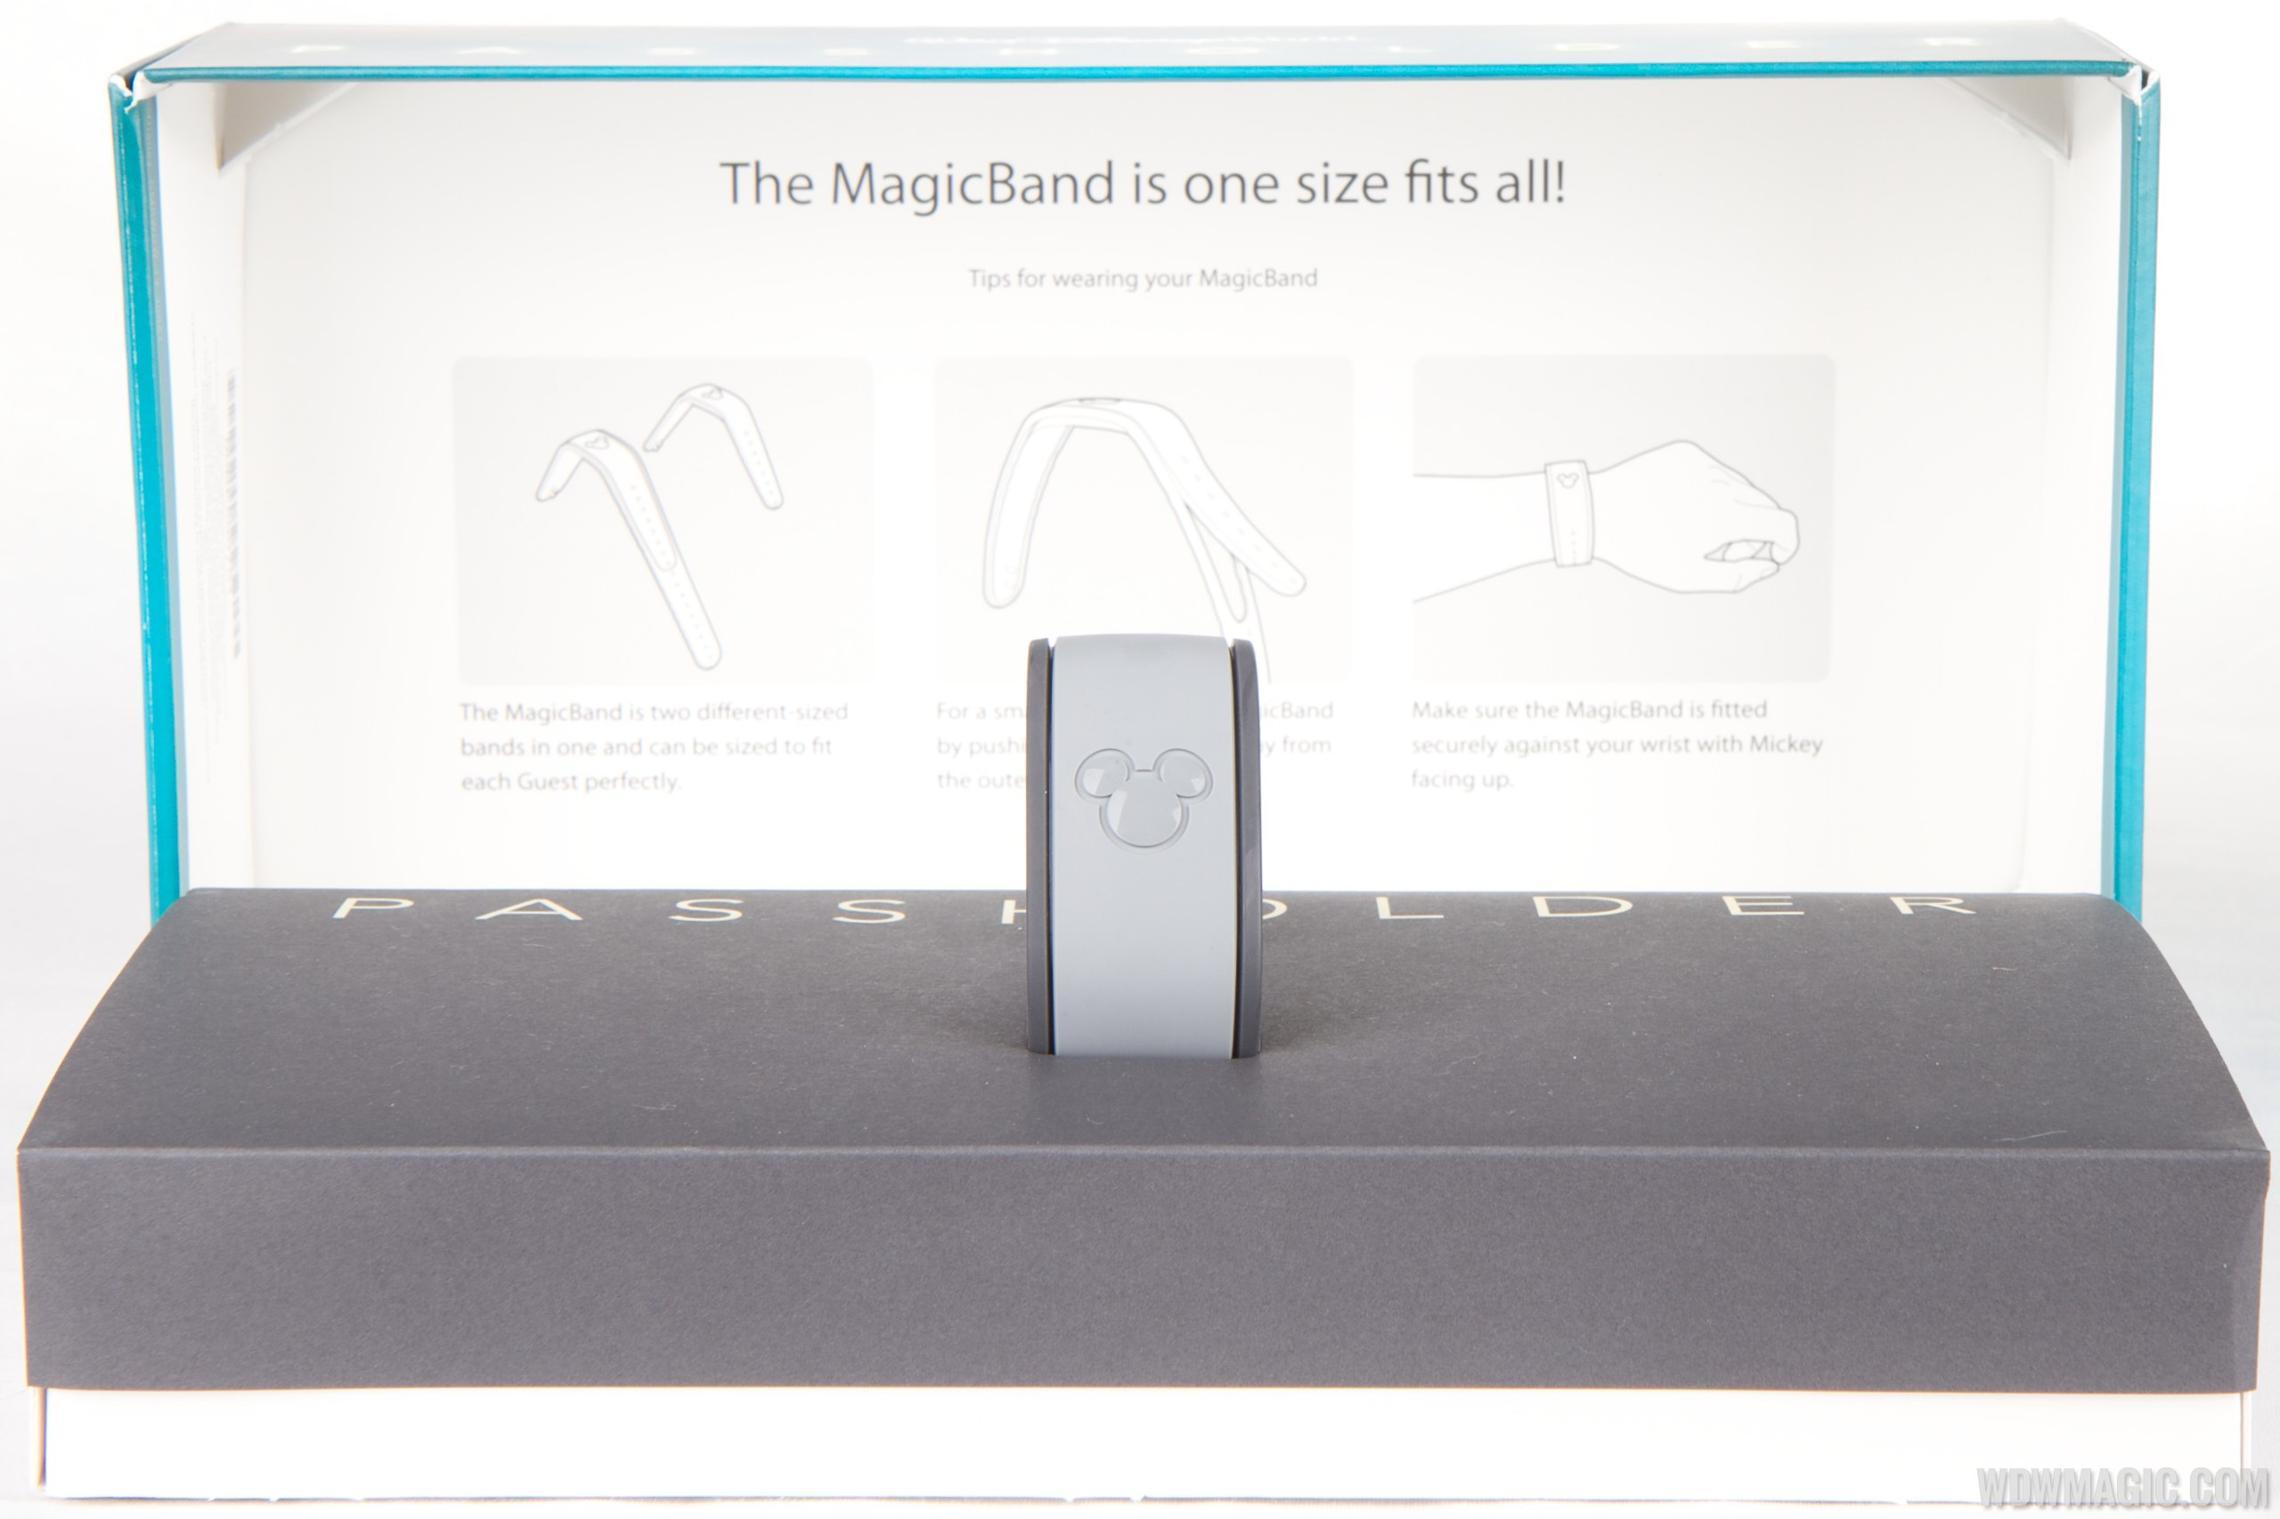 Passholder MagicBand inside the box